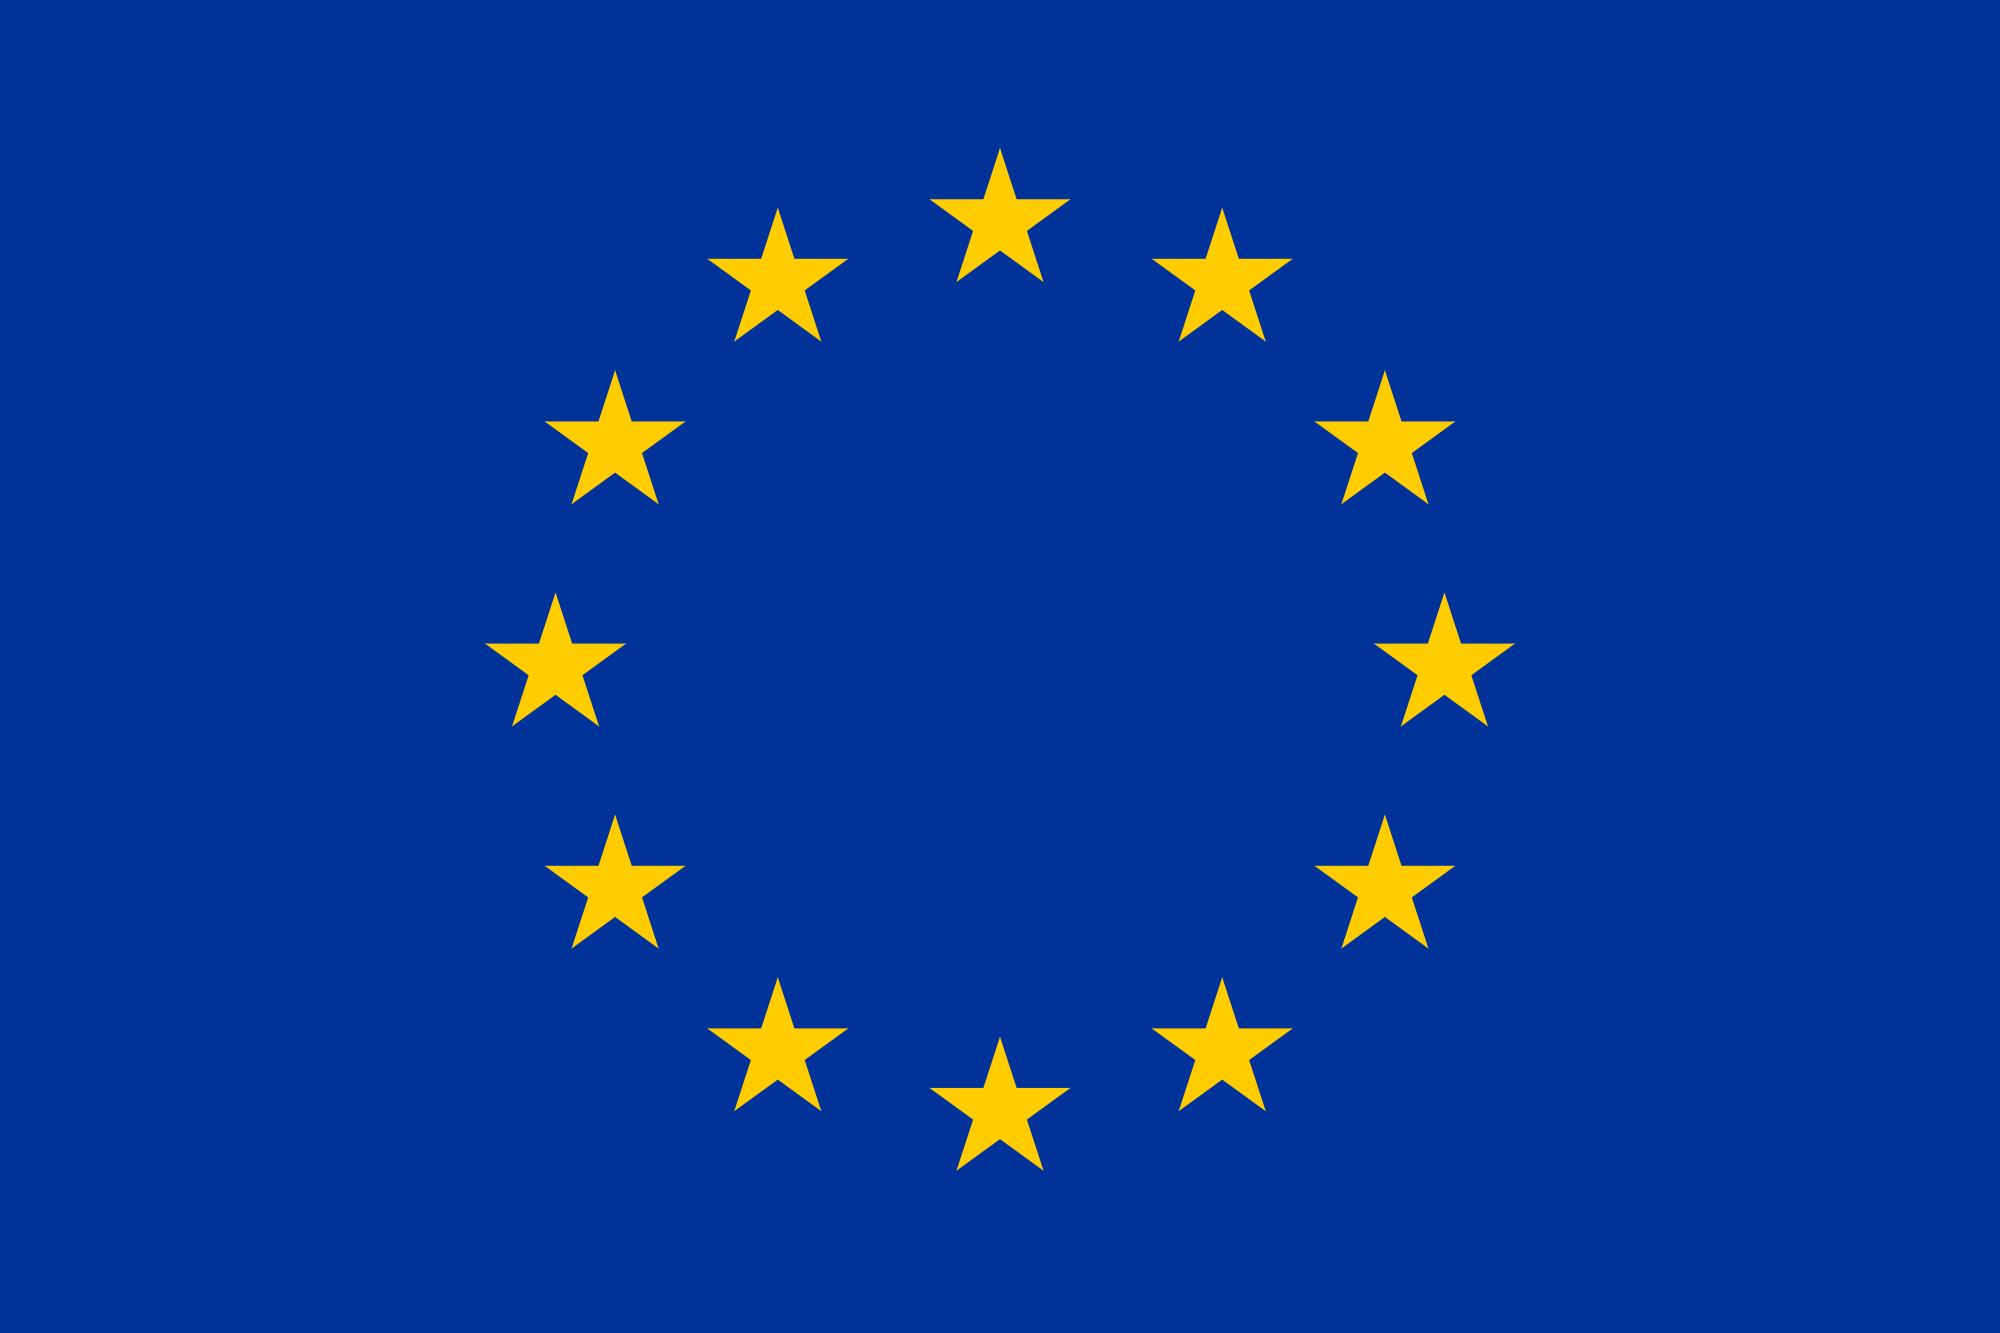 Image cj gtav transparent png gta wiki the grand theft auto wiki - Flag Of The European Union Flag Of The European Union